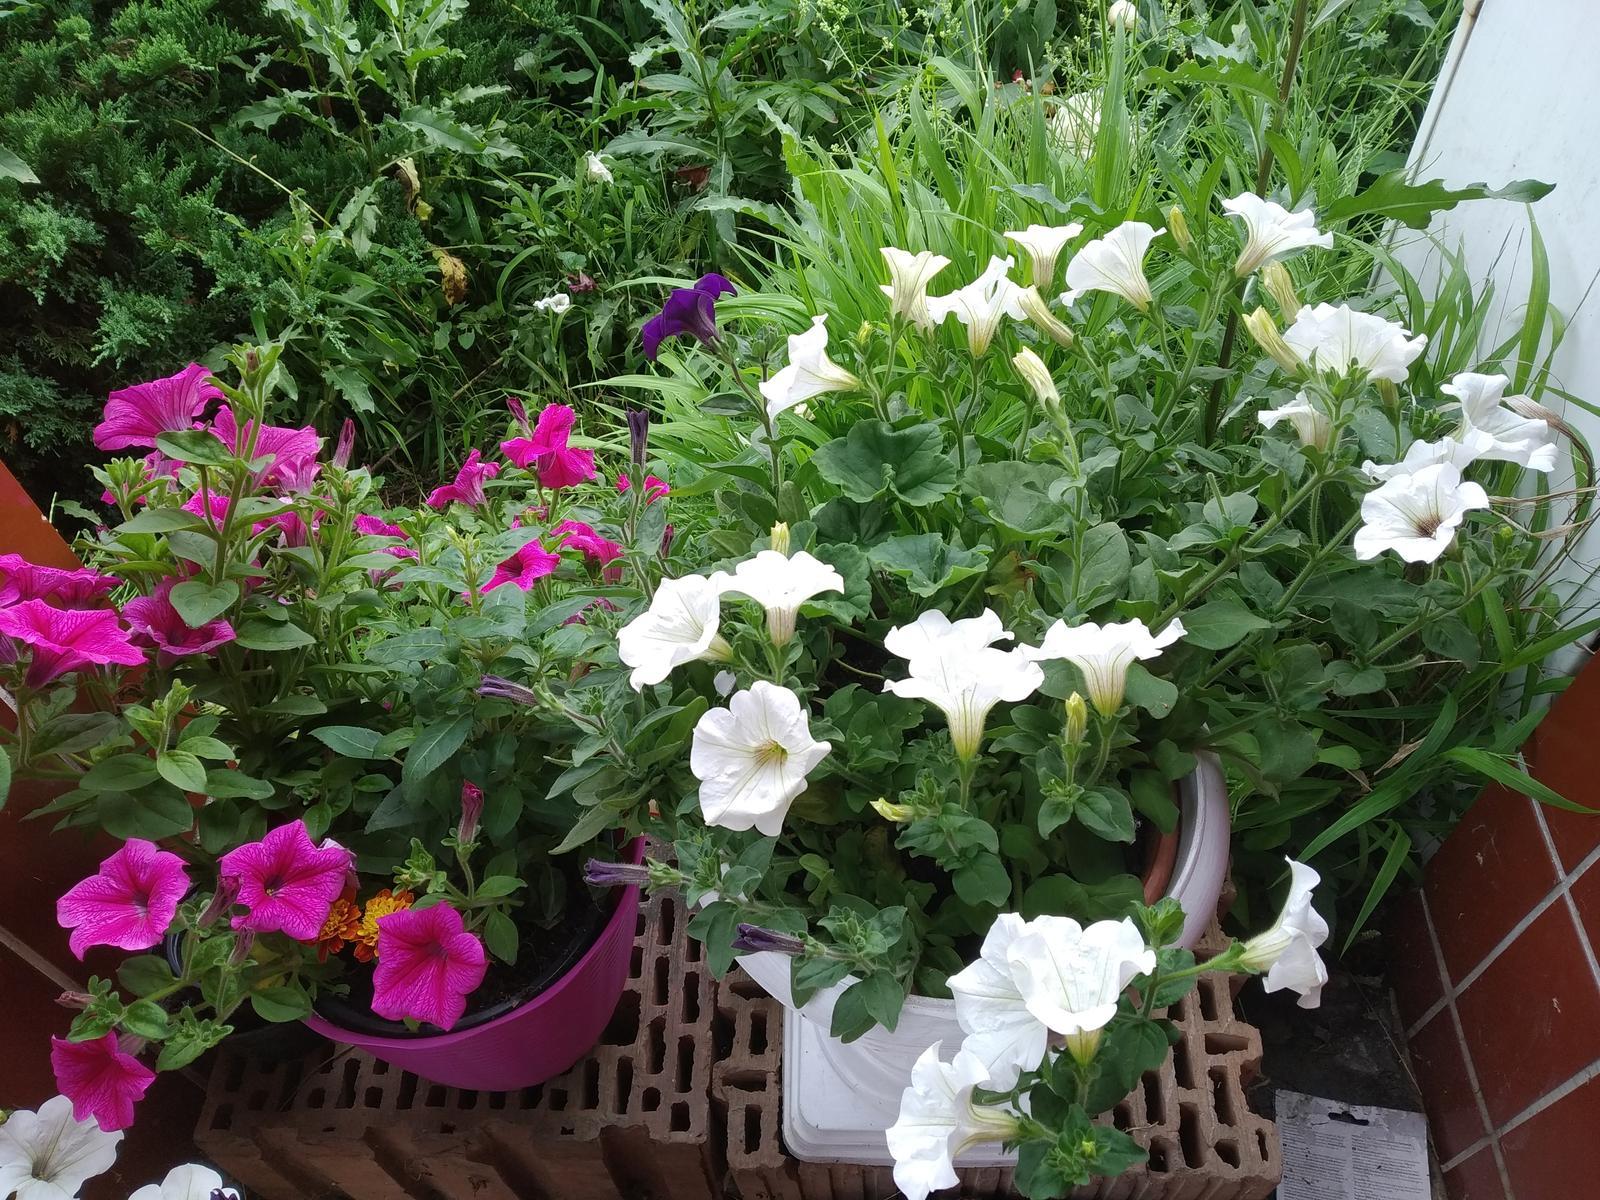 Babkina záhrada - Samé kvety